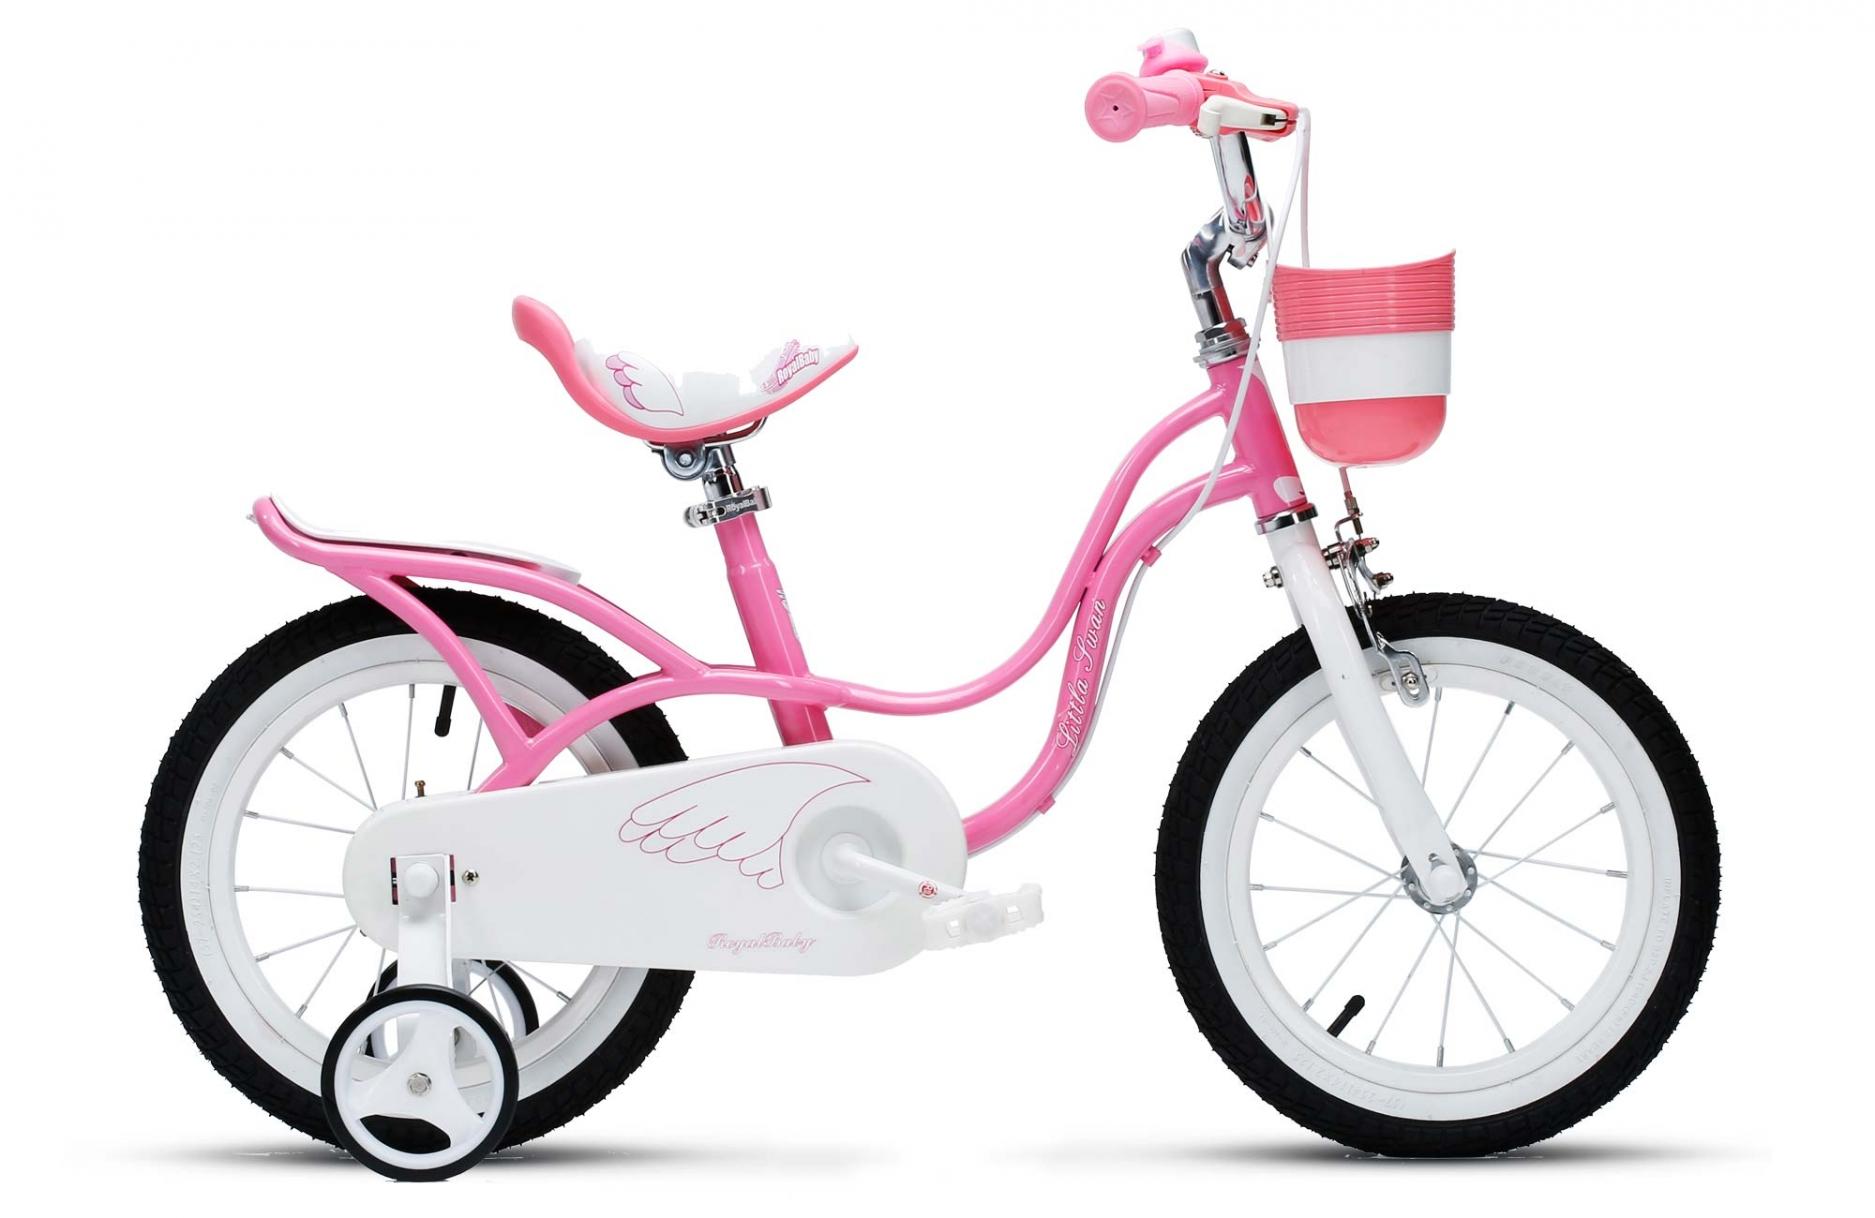 Велосипед Royal Baby Little Swan Steel 16 розовый one size